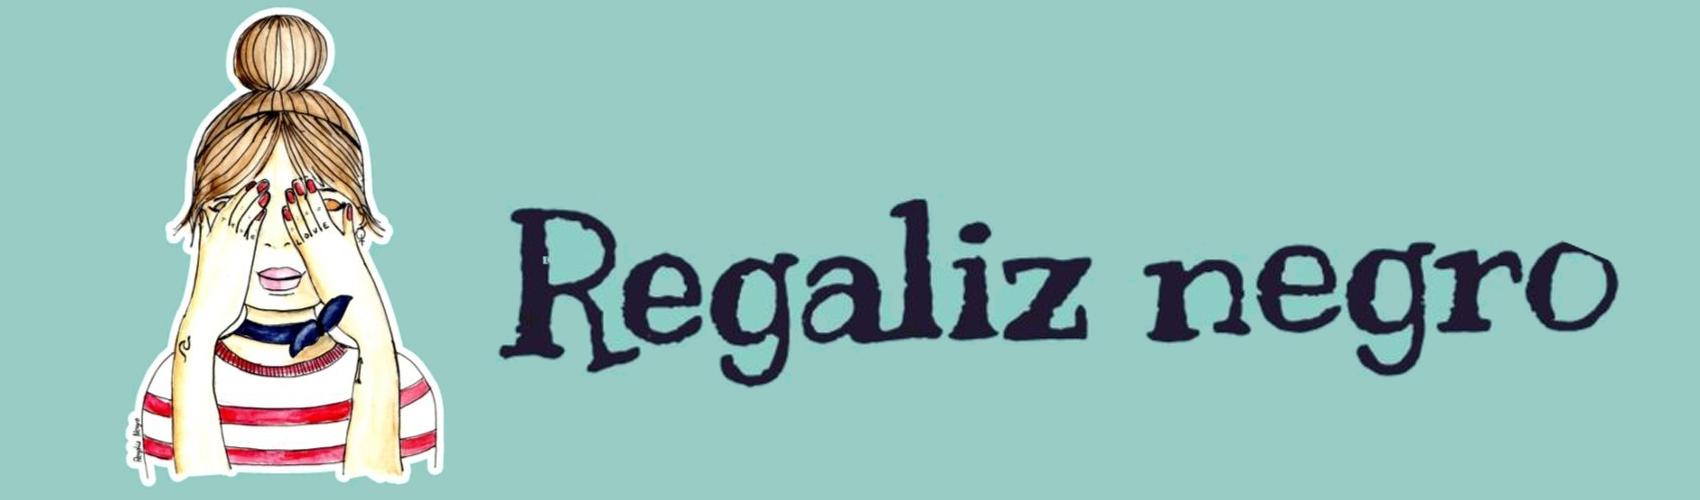 Regaliz Negro Shop